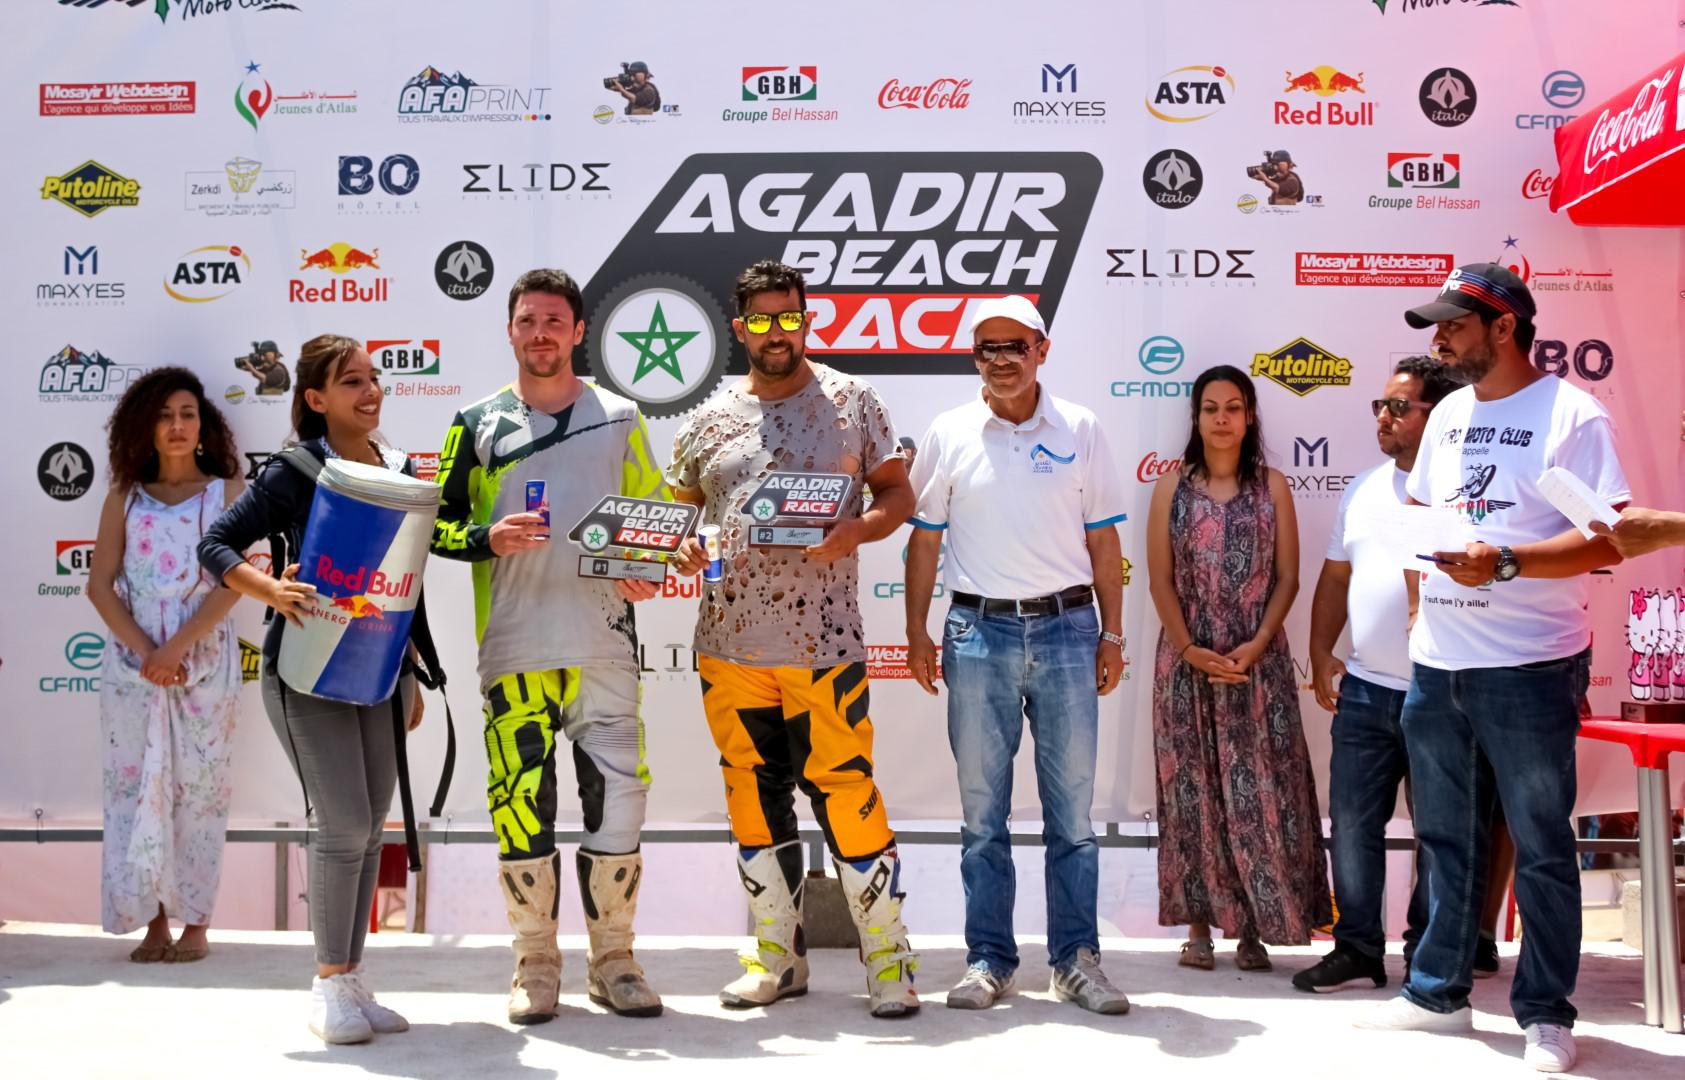 agadir-beach-race-la-reussite-791-8.jpg